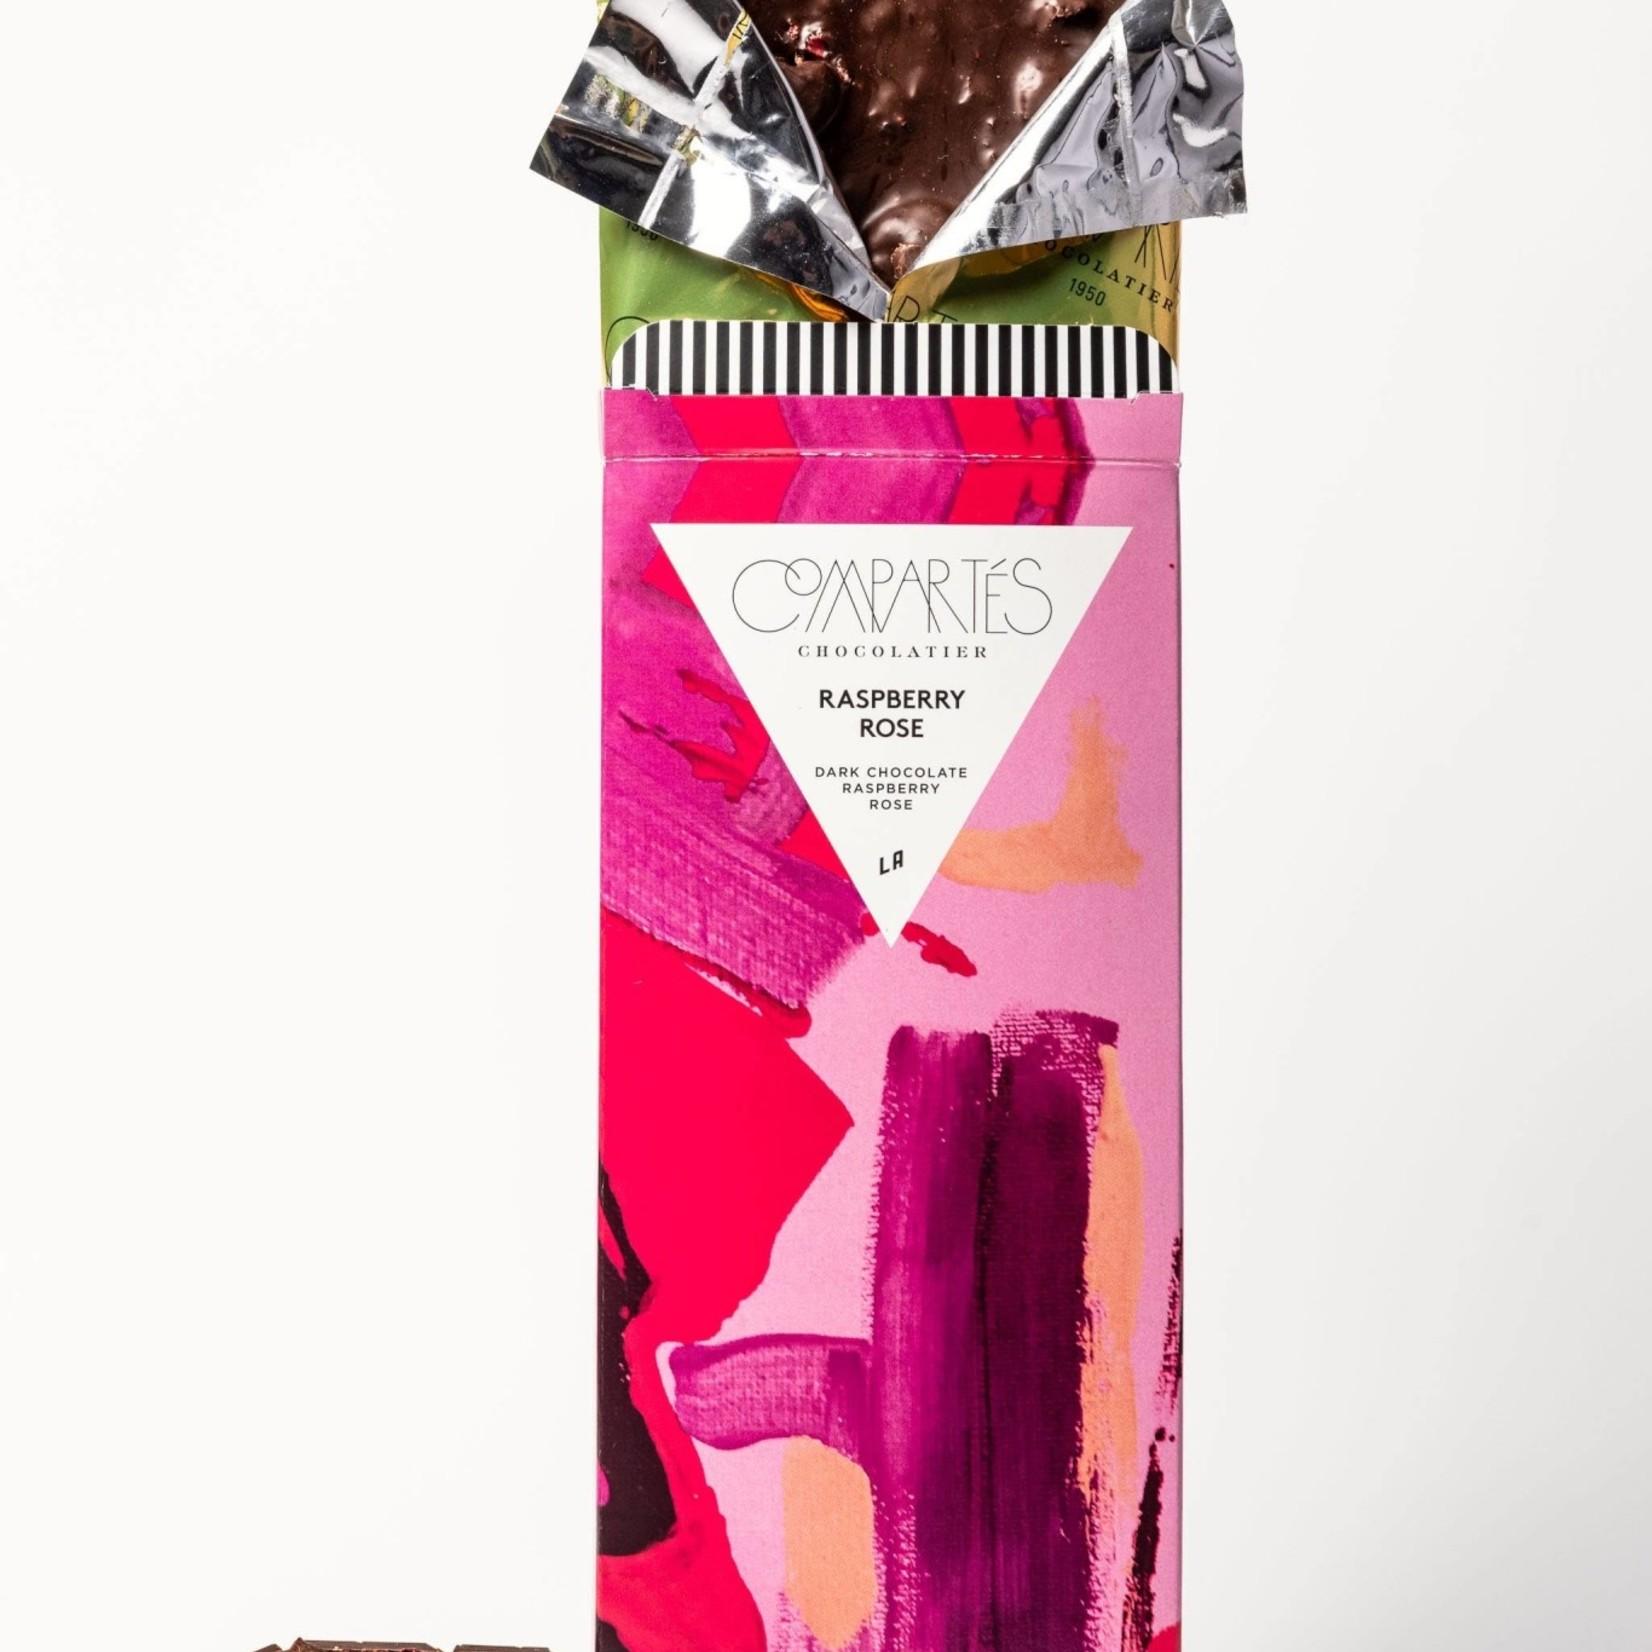 Compartes Chocolate Compartes Chocolate Raspberry Rose Gourmet Dark Chocolate Bar